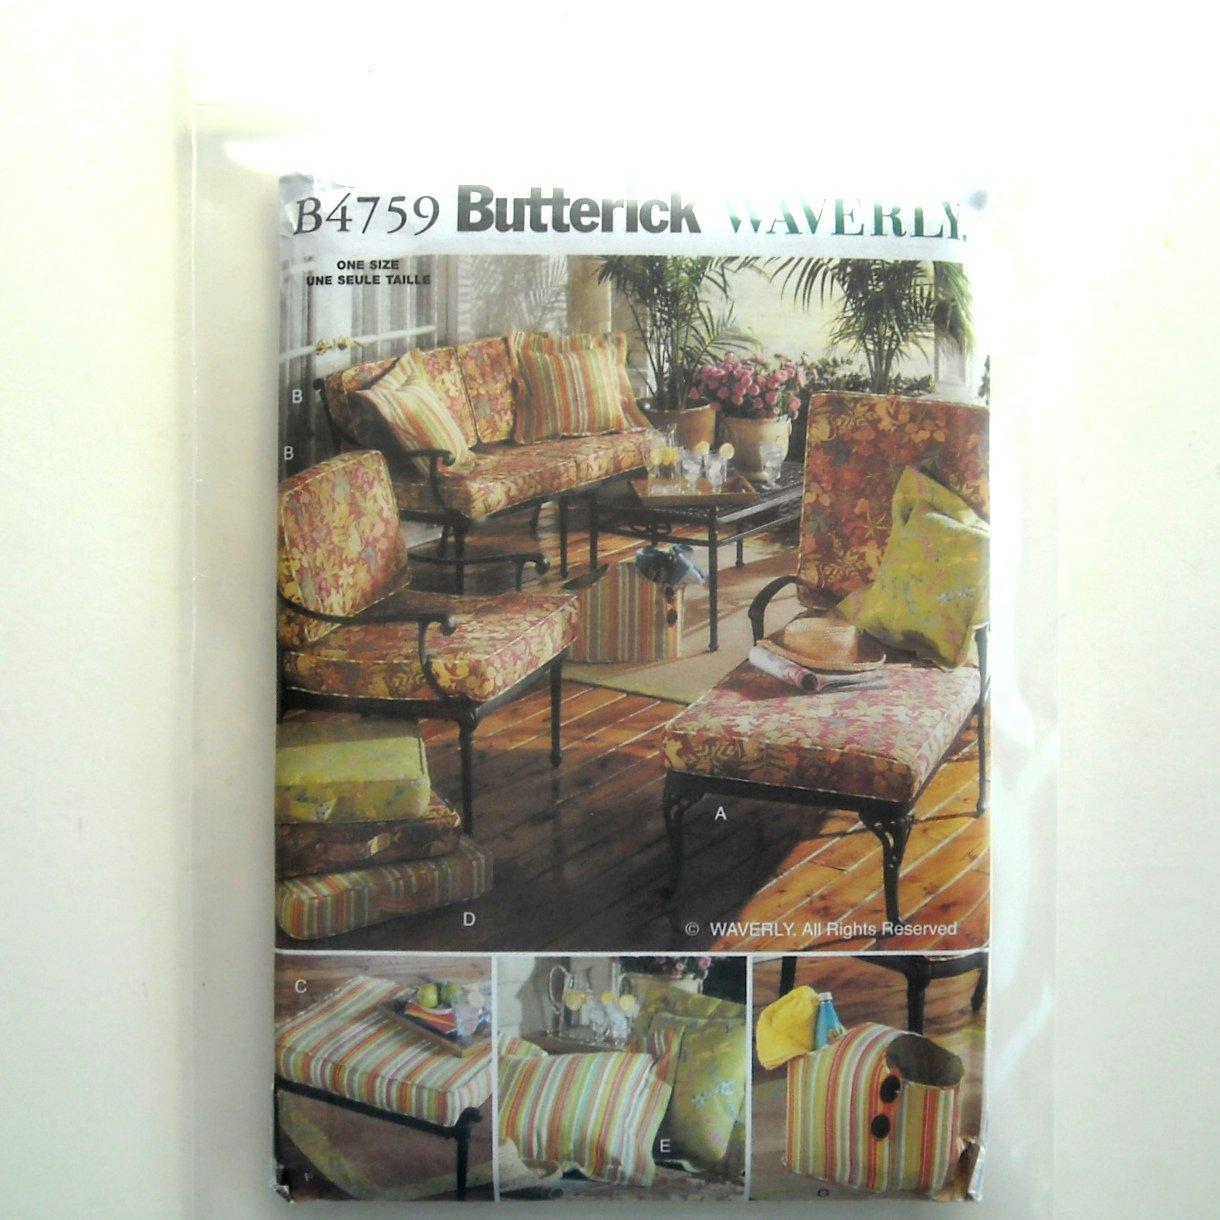 Butterick Pattern B4759 Waverly Outdoor Living Seat Cushion